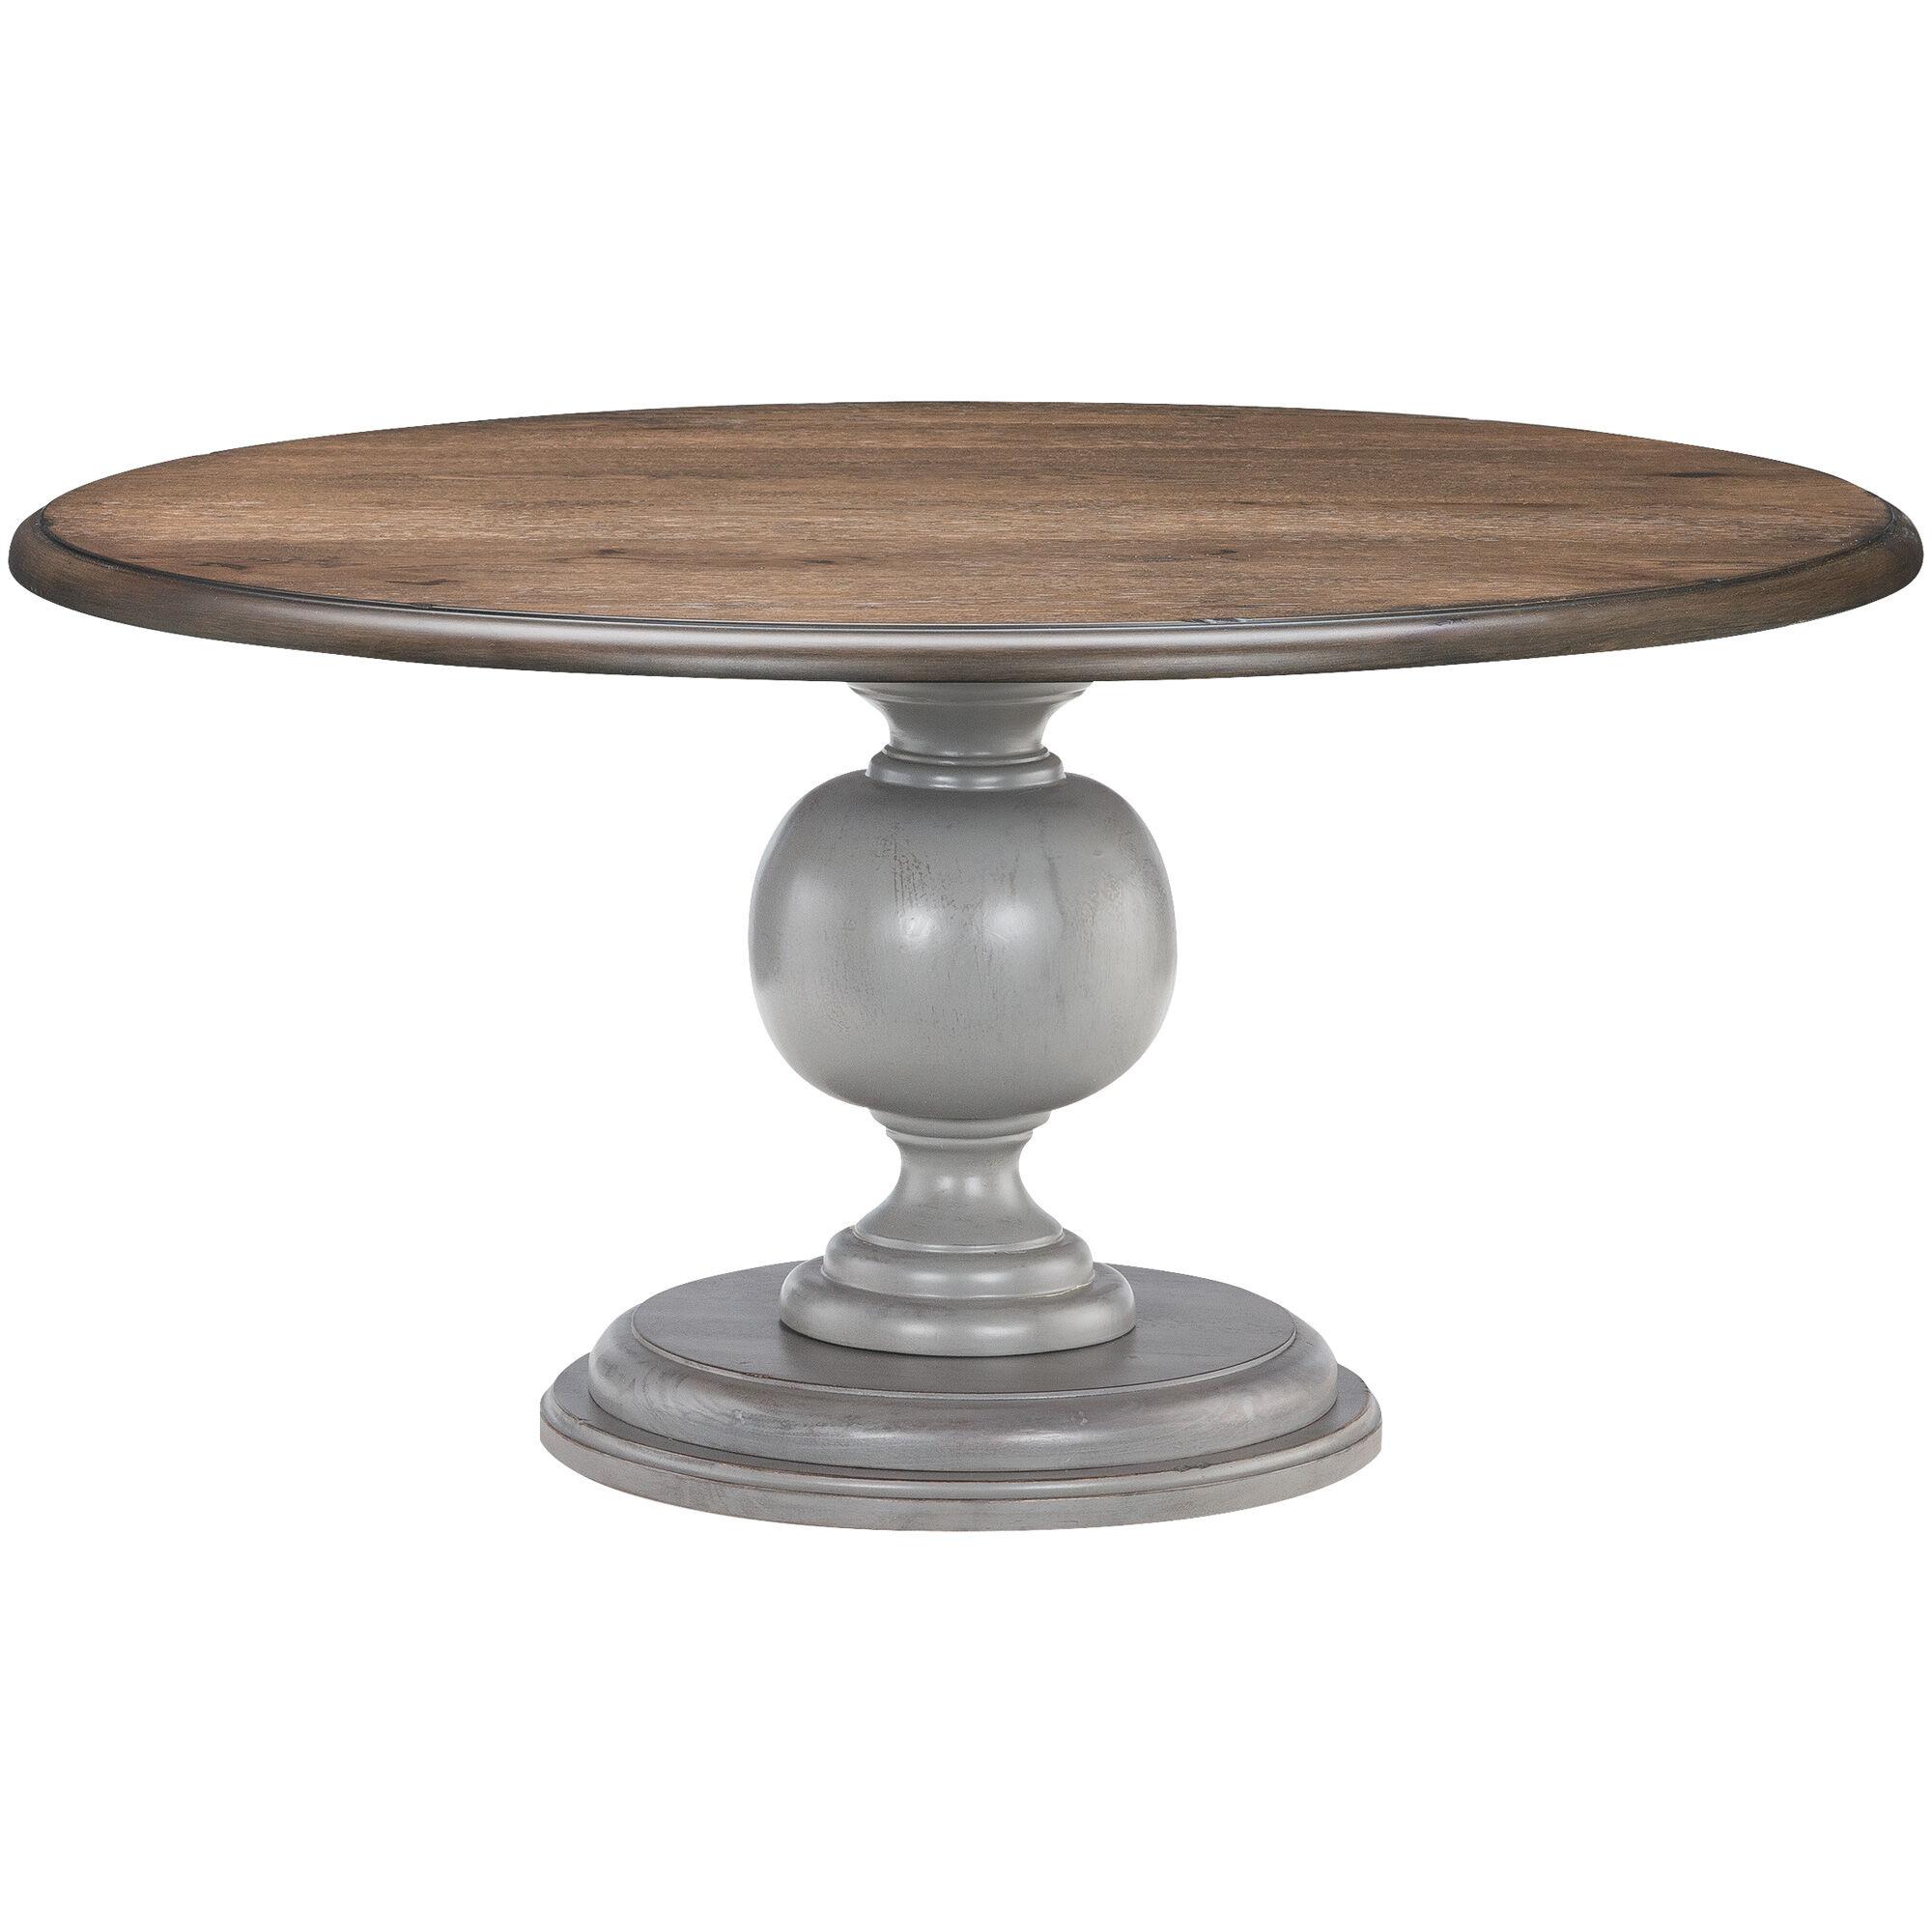 Colonnades Round Pedestal Coffee Table